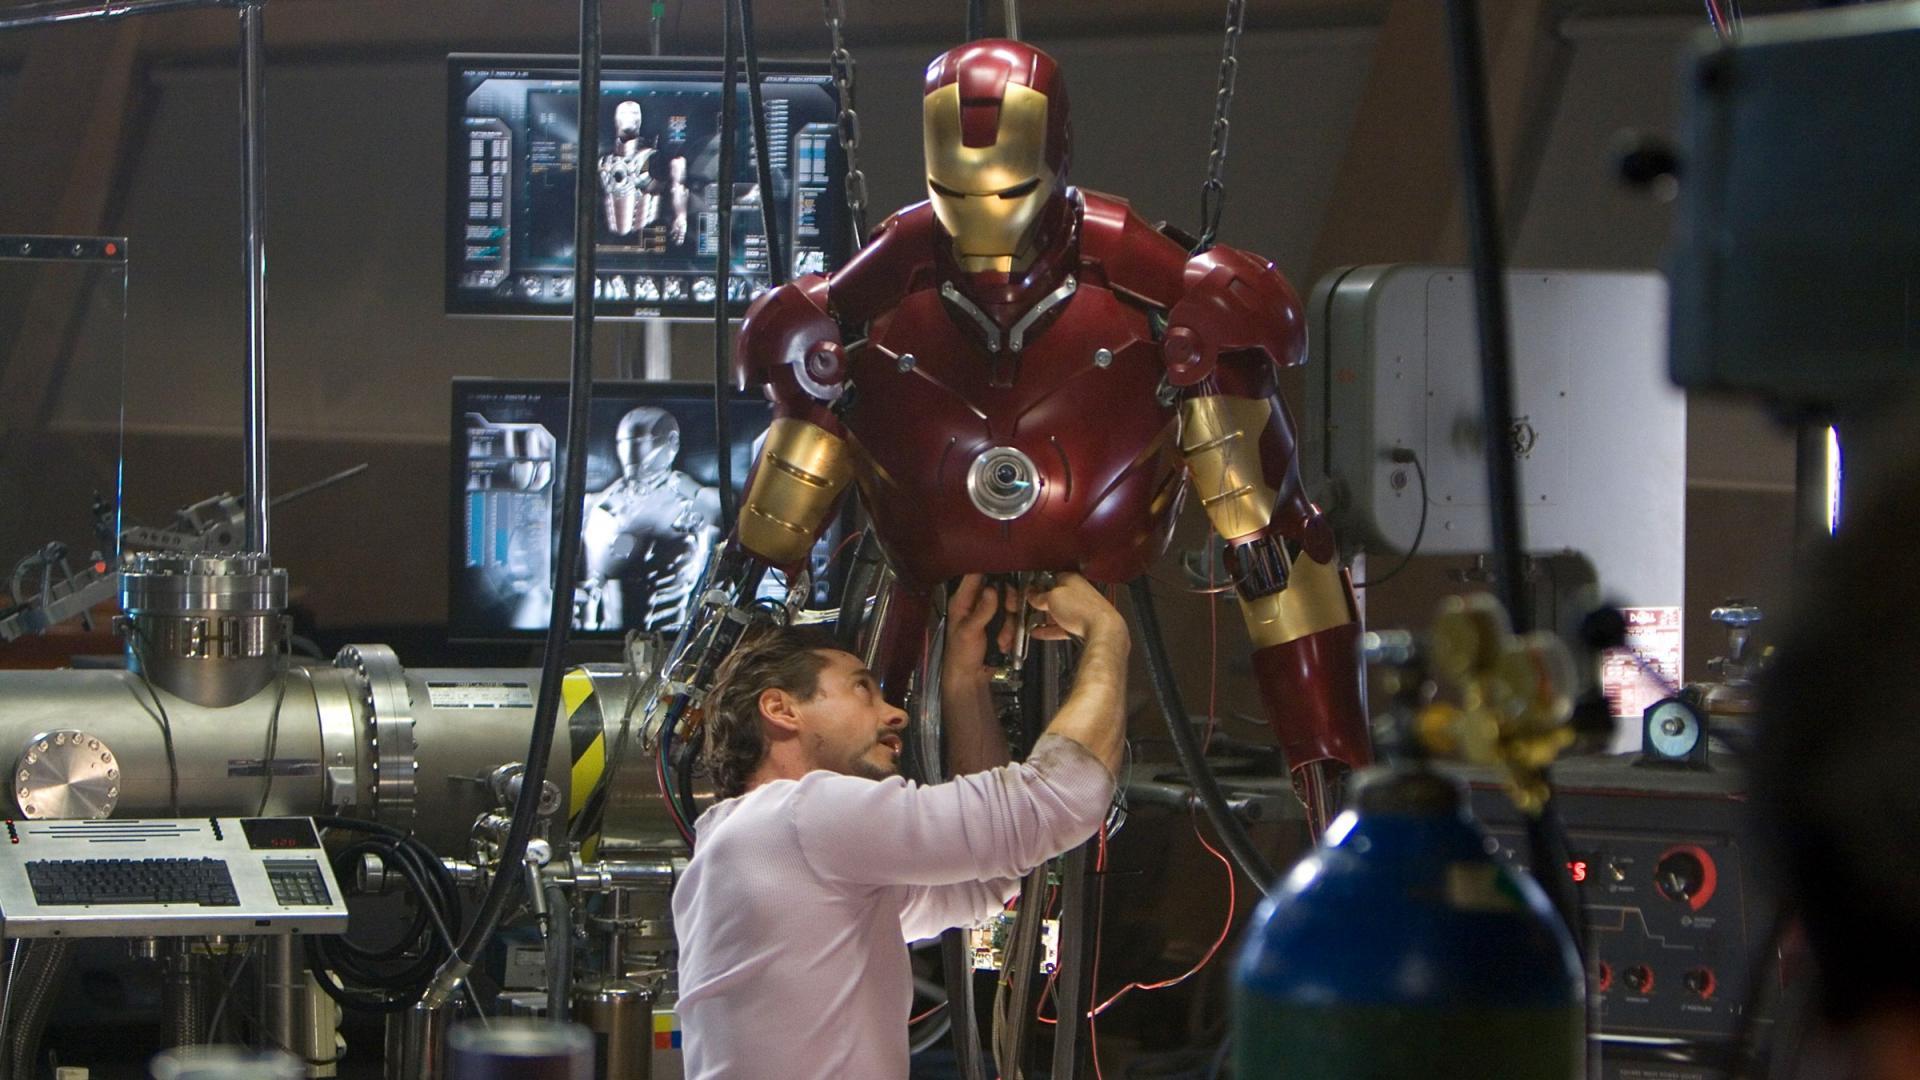 iron man epic hero movies hd wallpaper   12975   HQ Desktop 1920x1080